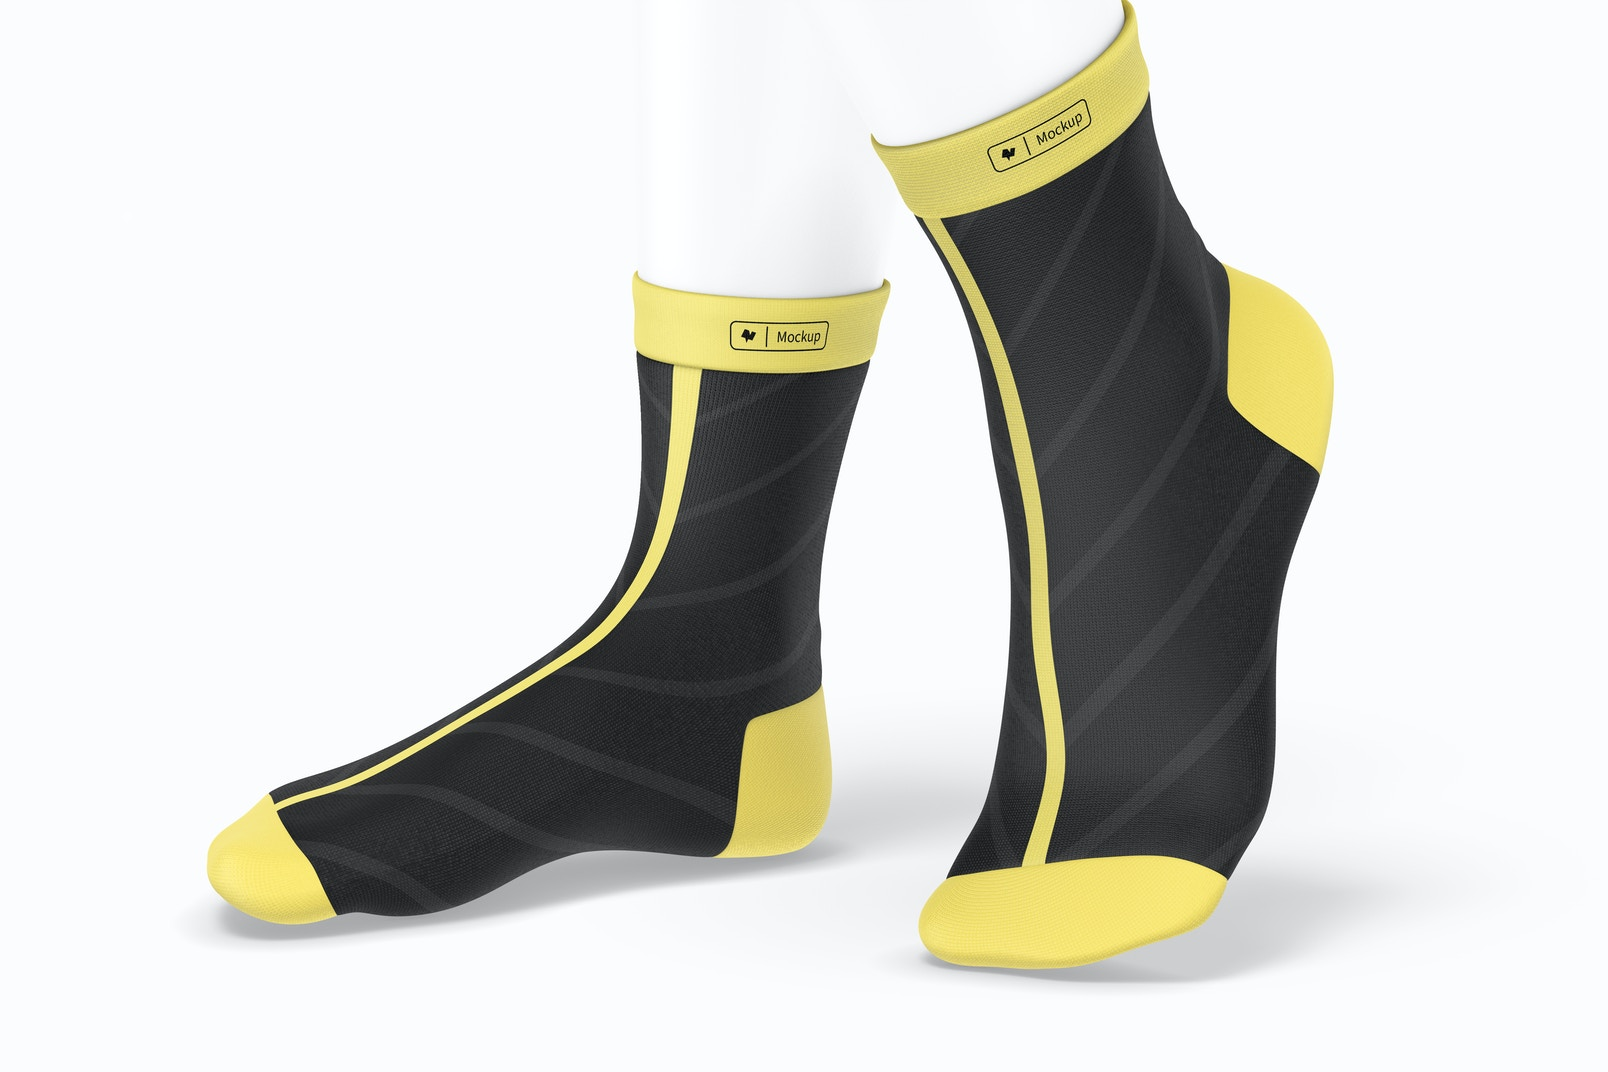 Sports Cycling Socks Mockup, Right View